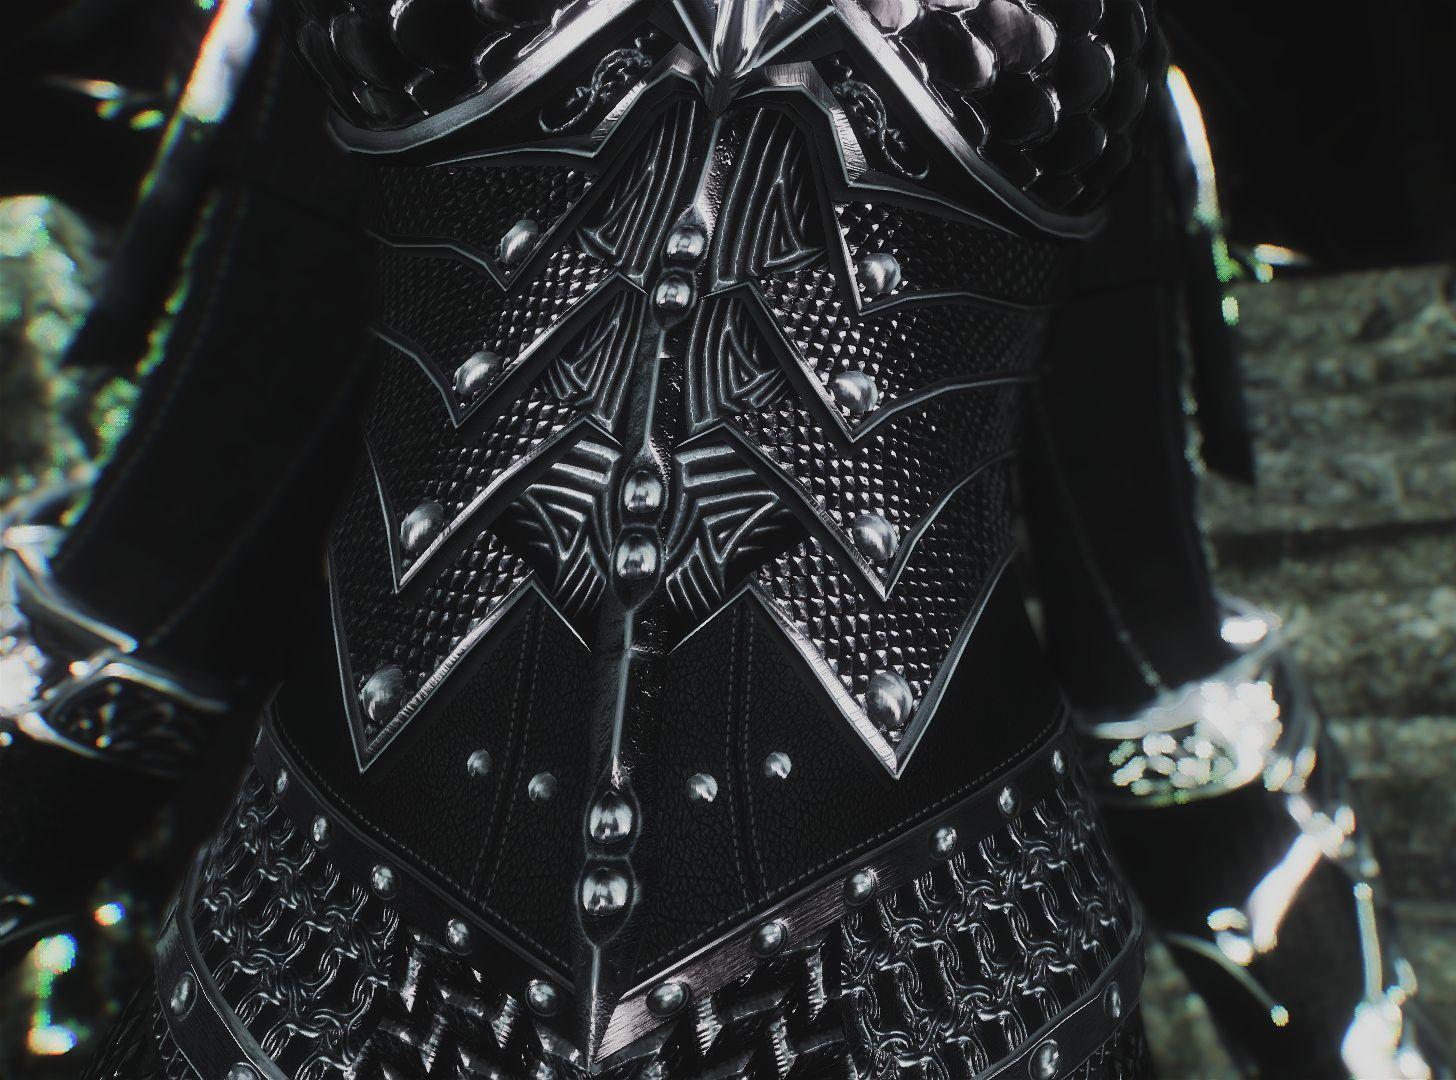 19.jpg - Elder Scrolls 5: Skyrim, the